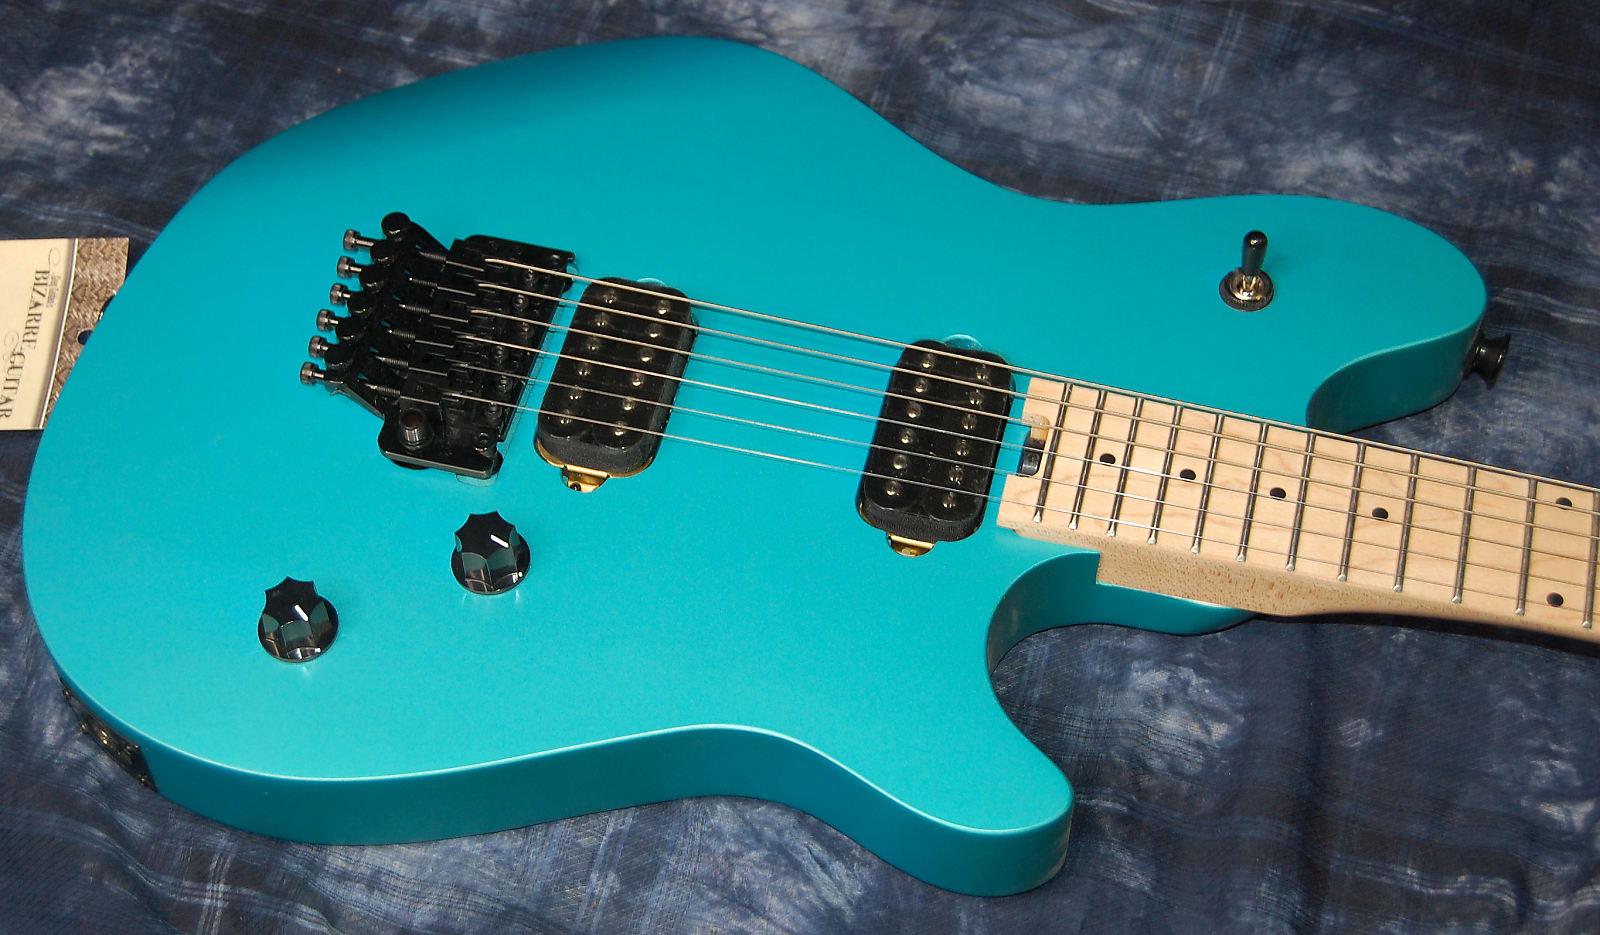 Mint Evh Wolfgang Wg Standard Maple Matte Blue Frost Eddie Van Halen Authorized Dealer Save Big